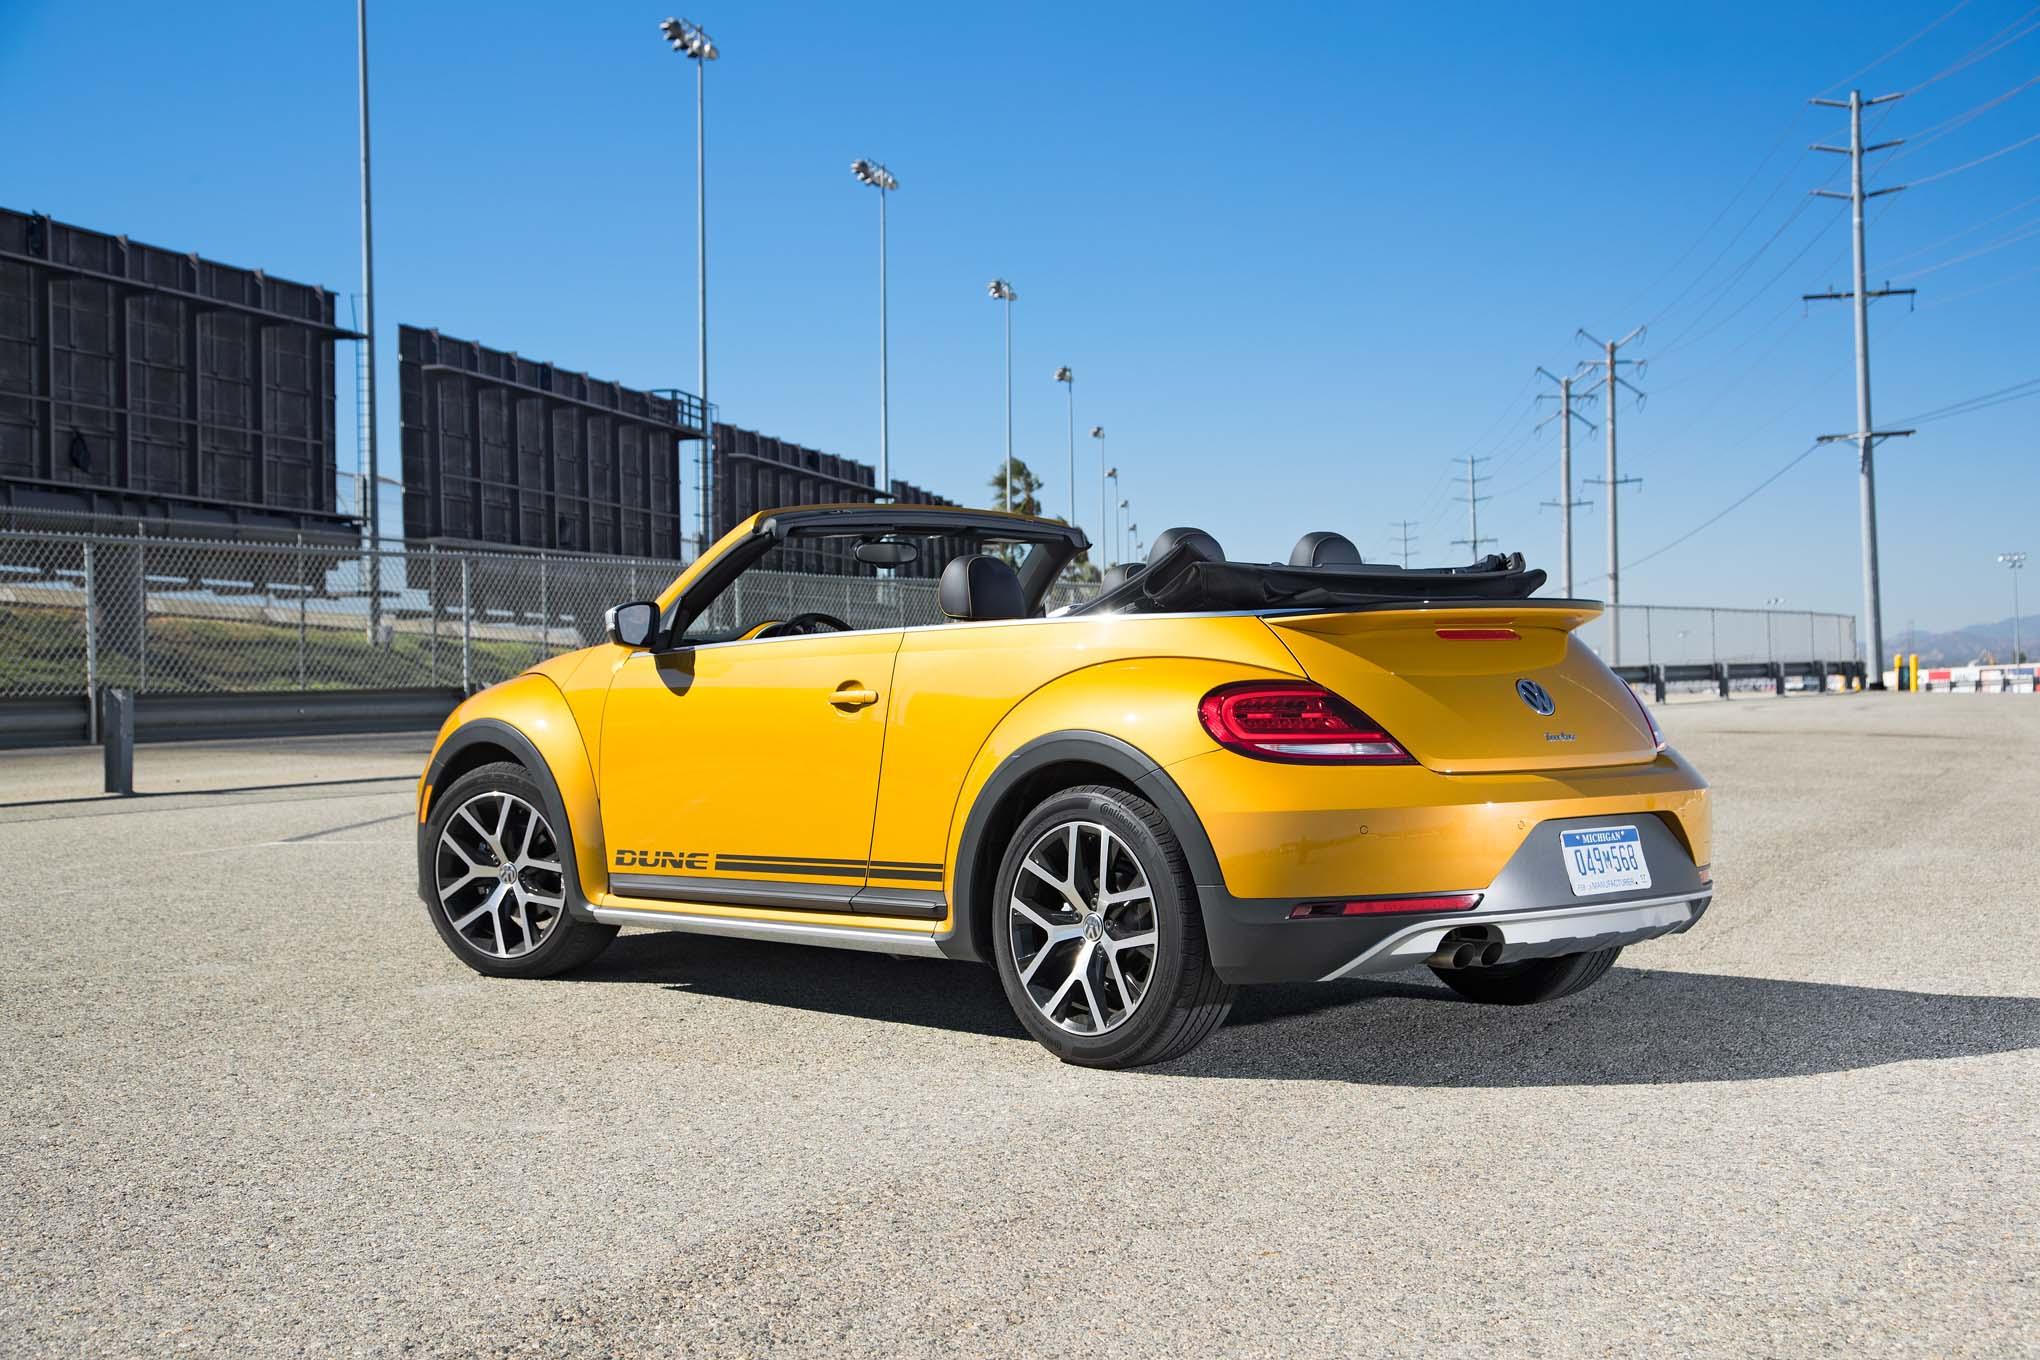 volkswagen beetle scirocco may get the axe automobile. Black Bedroom Furniture Sets. Home Design Ideas